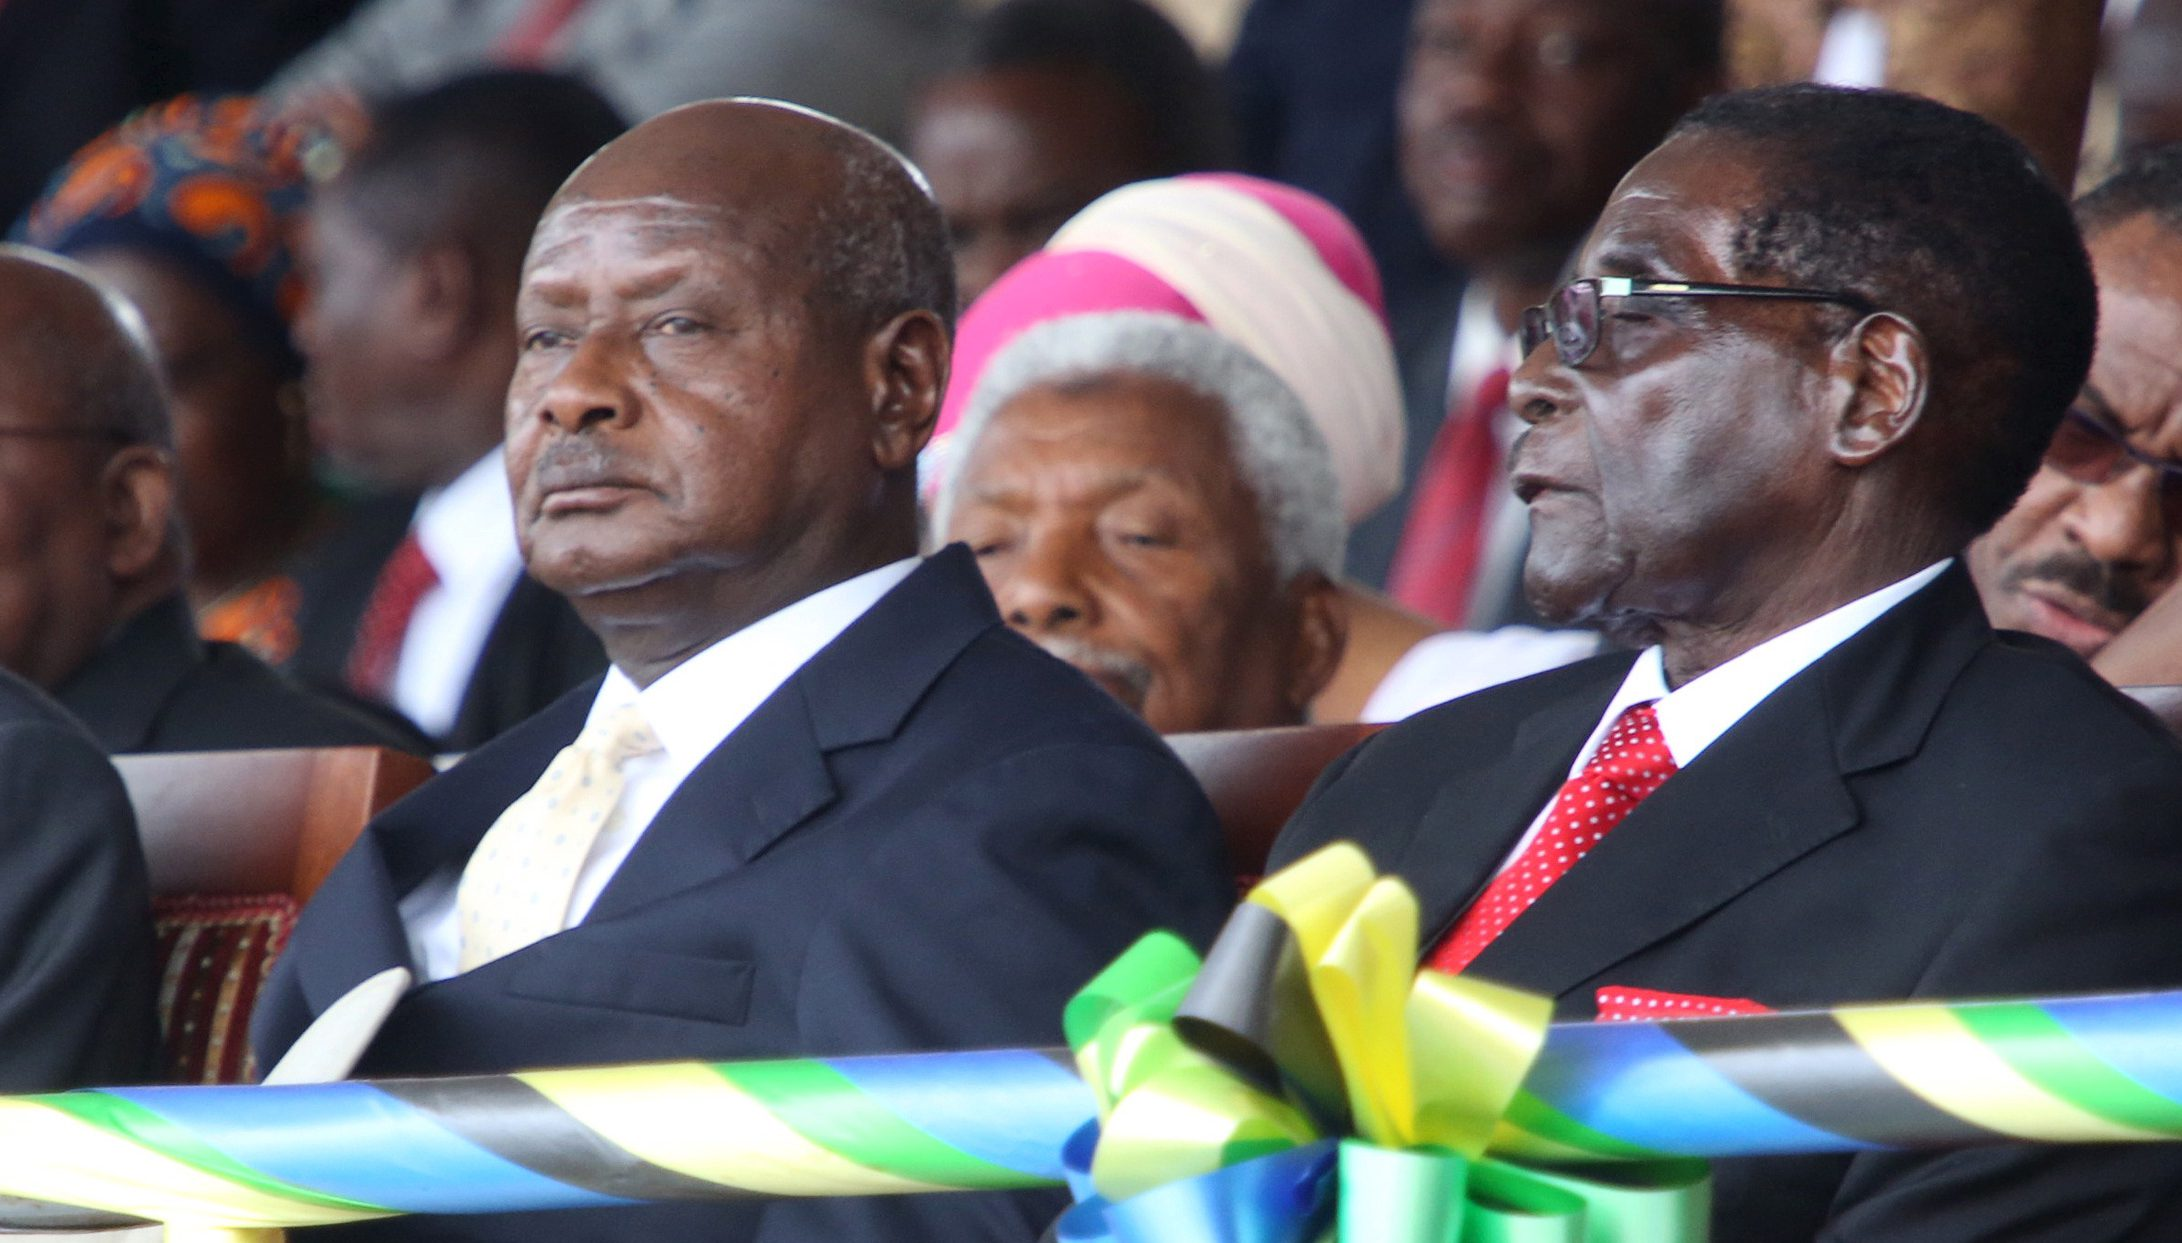 Rwanda's President Kagame, Uganda's President Museveni and Zimbabwe's President Mugabe attend the inauguration ceremony of Tanzania's President-elect Magufuli at the Uhuru Stadium in Dar es Salaam